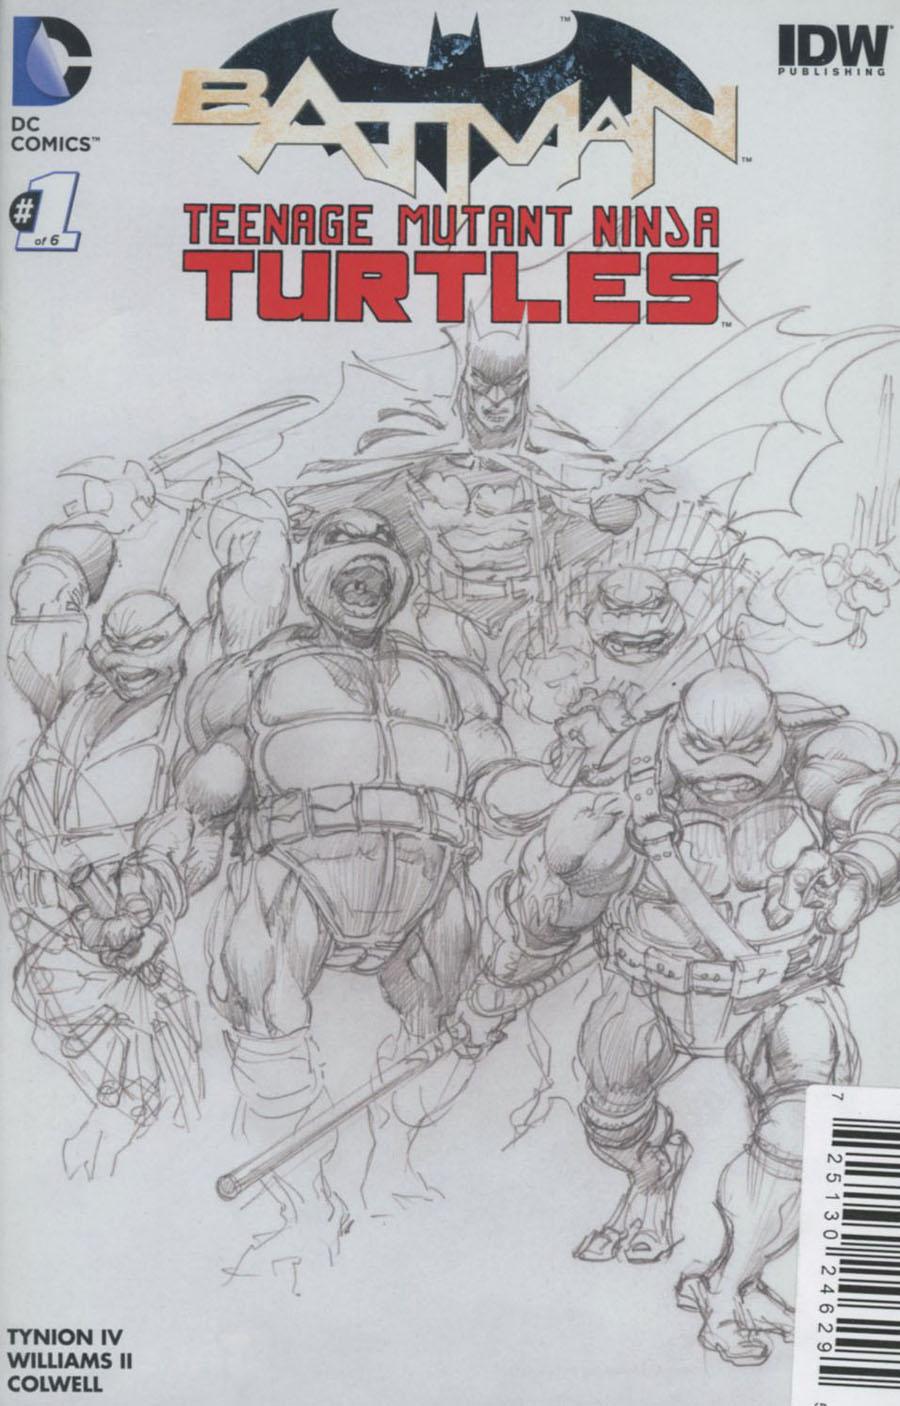 Batman Teenage Mutant Ninja Turtles #1 Cover L DF Exclusive Neal Adams Black & White Variant Cover Plus 3